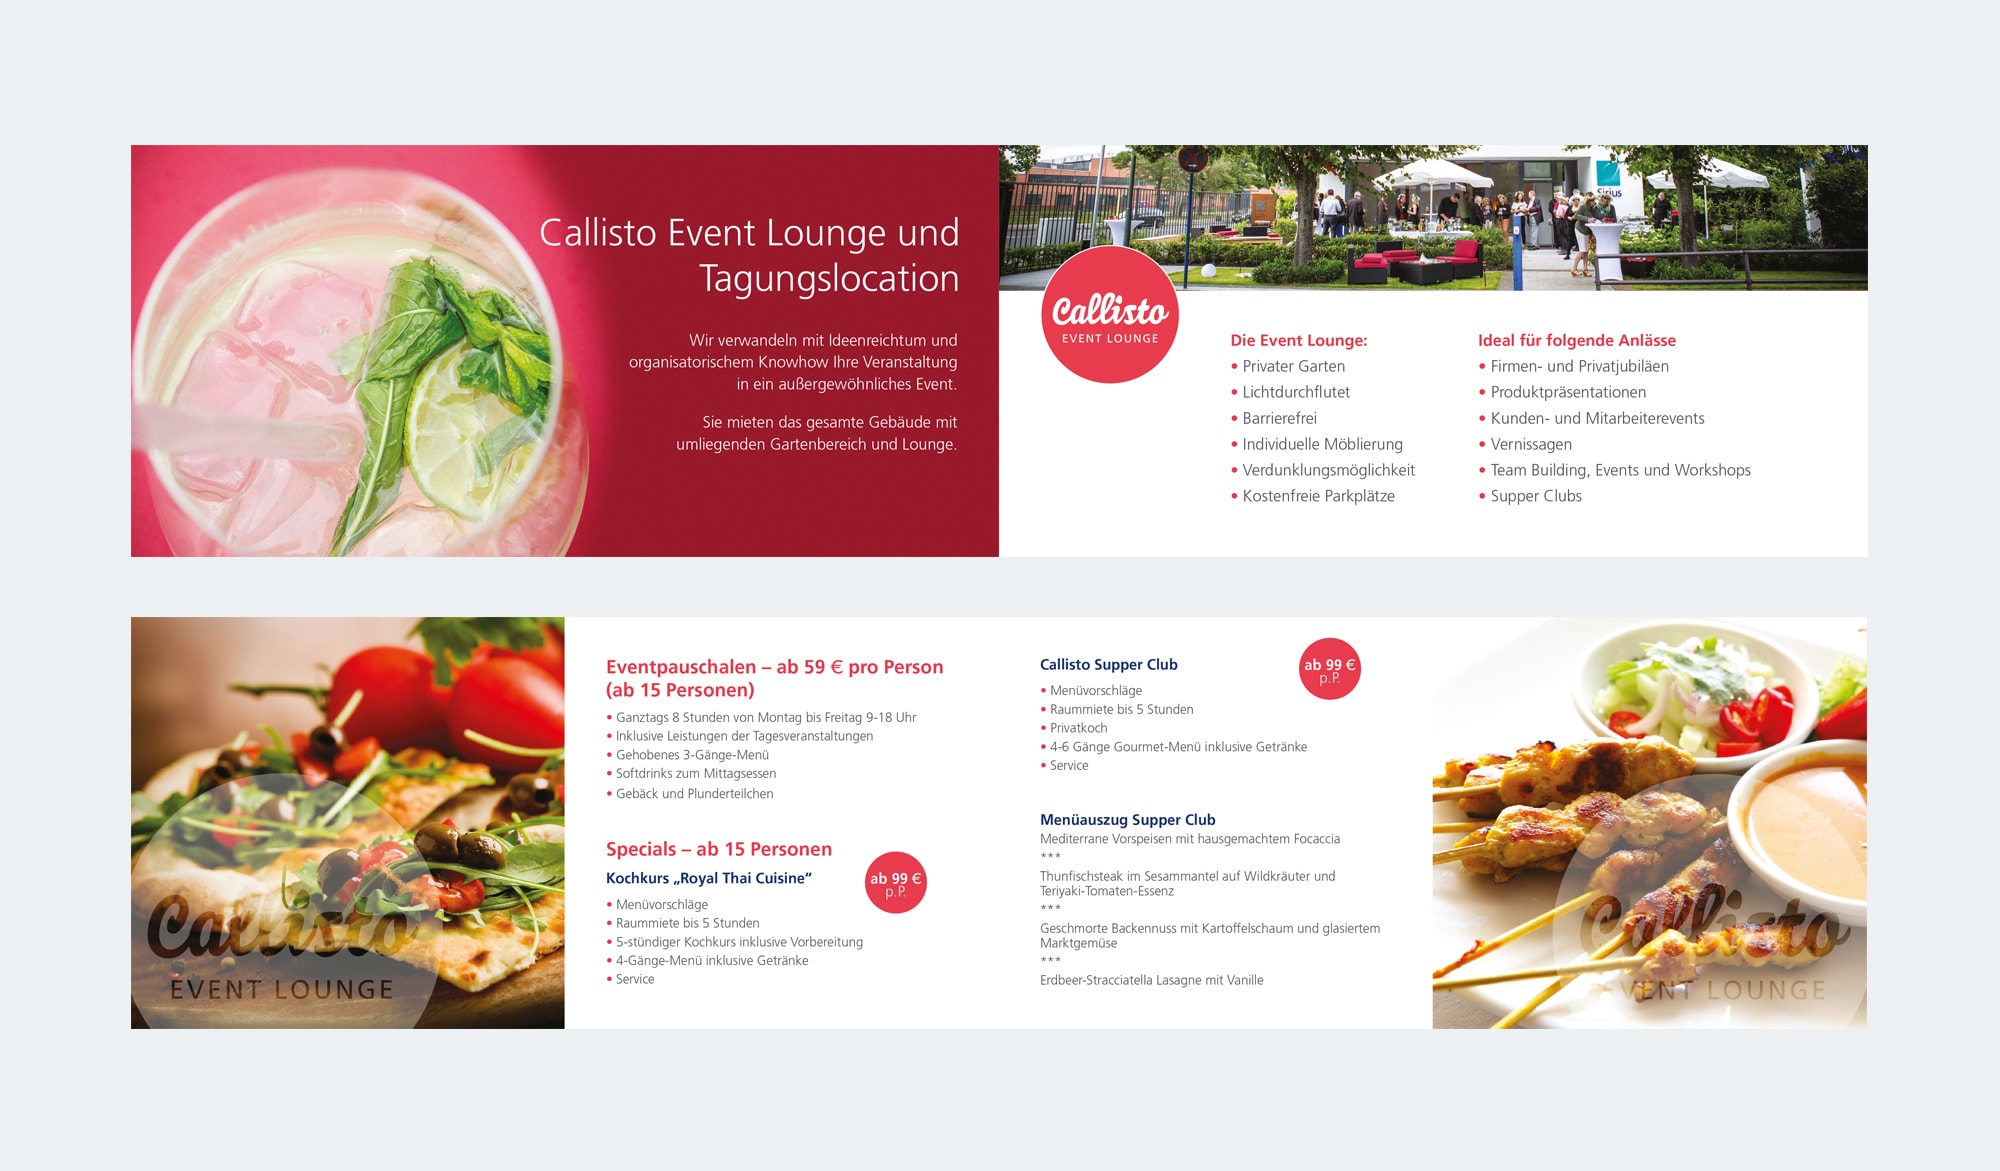 Callisto event lounge - brochure